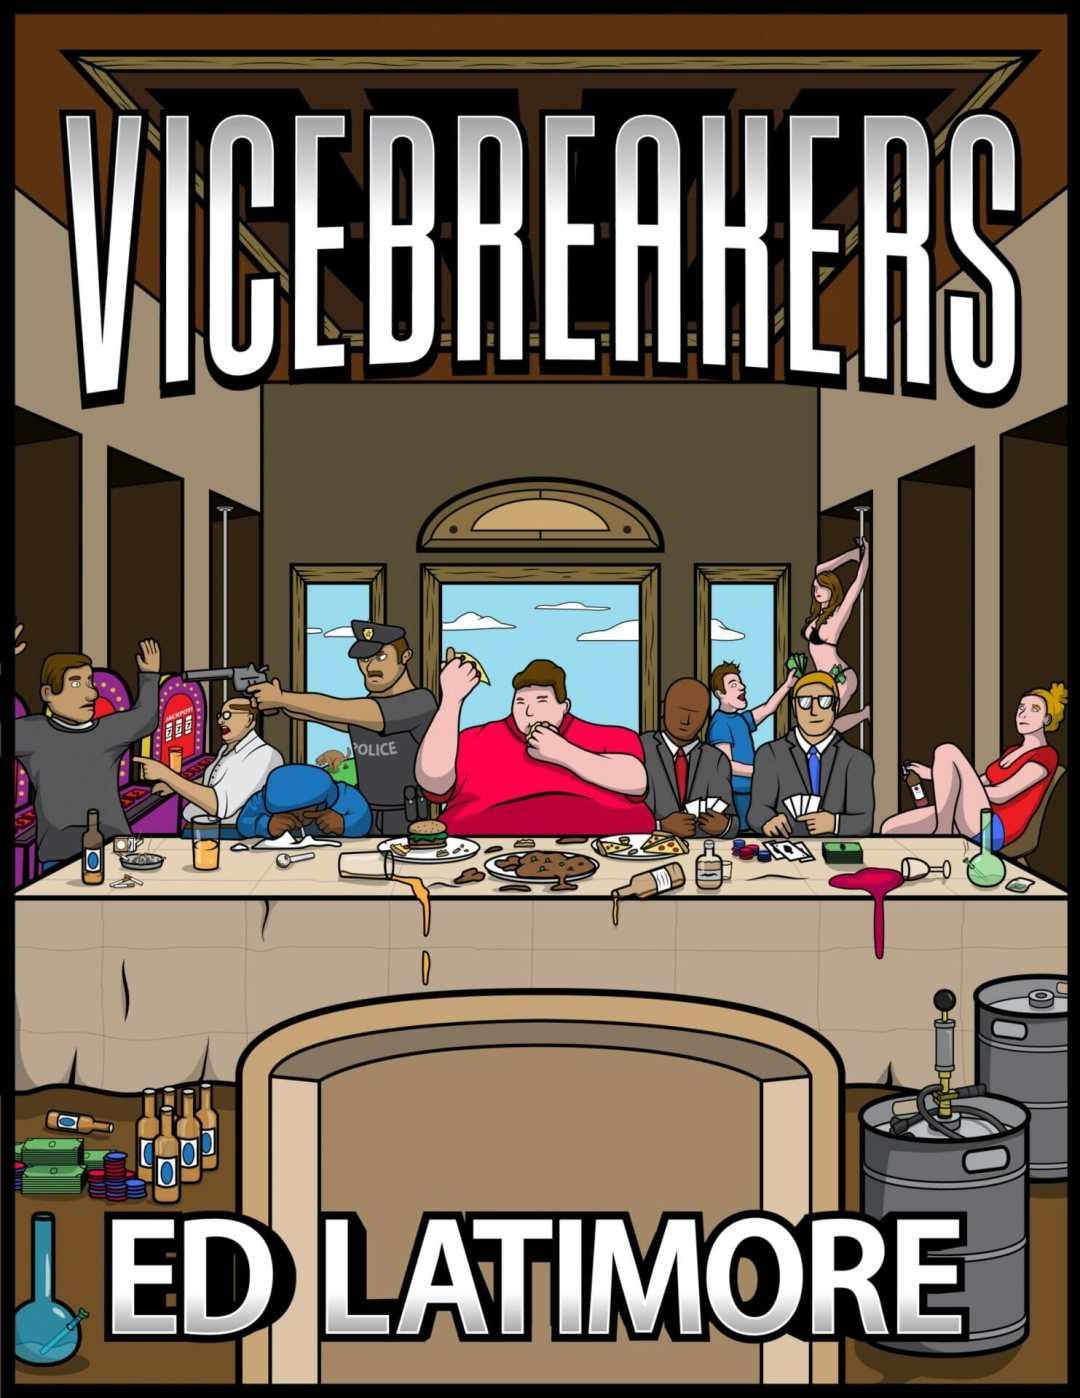 Ed Latimore Vicebreakers cover-01